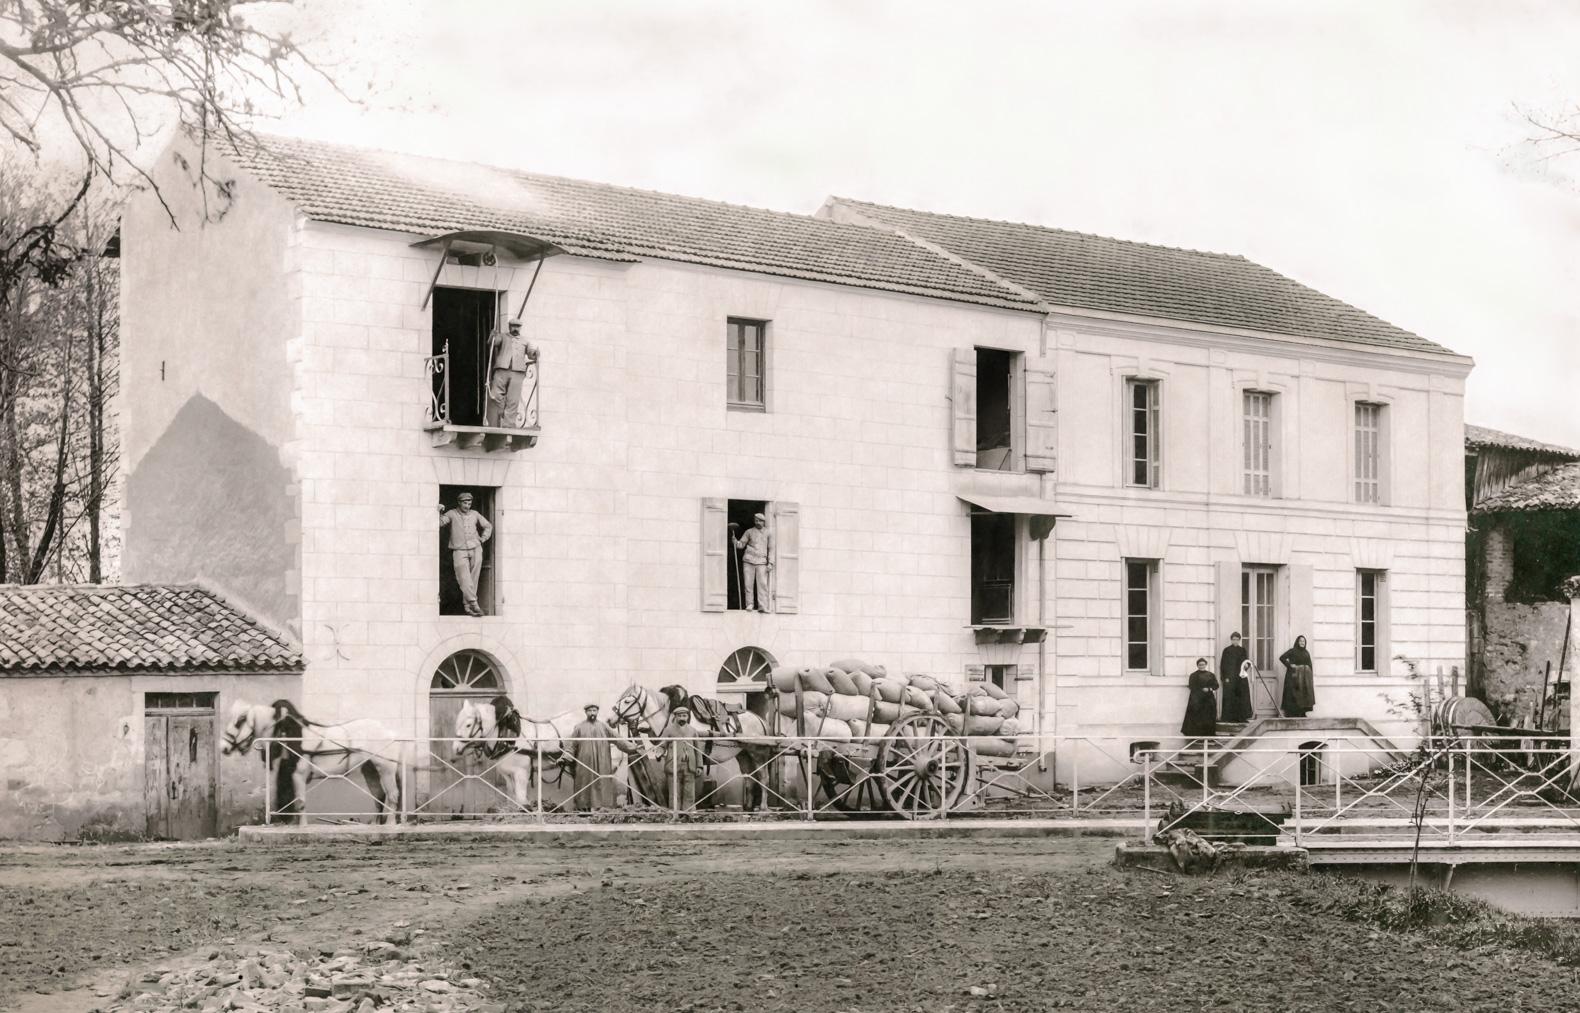 14-10-11-Moulin-Reguignon-Reference-1580px